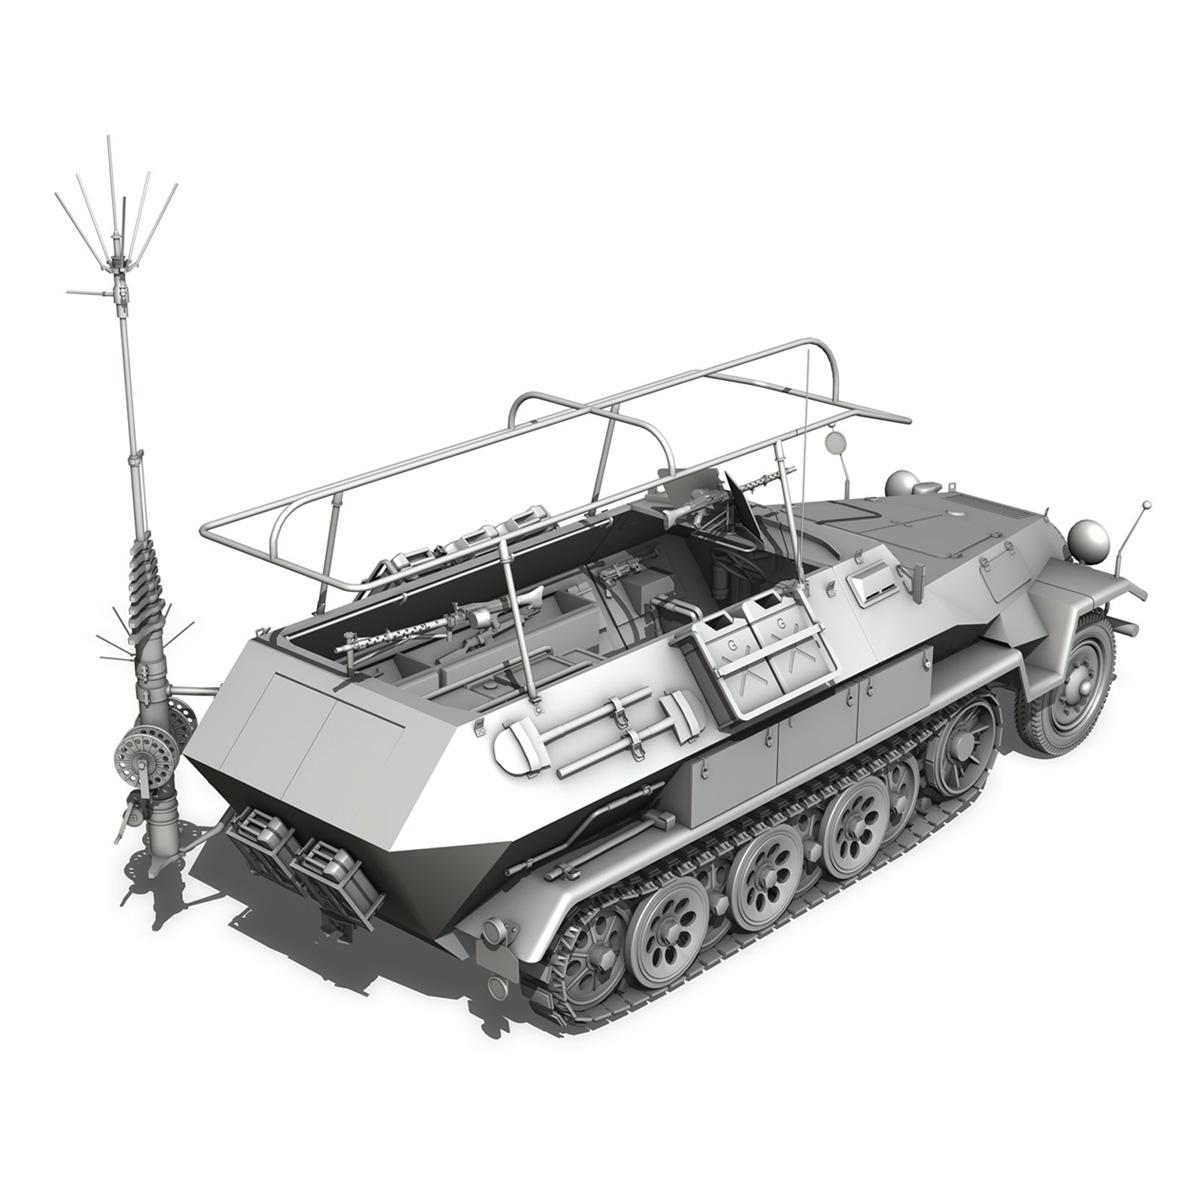 sdkfz 251 ausf.b – communications vehicle 3d model 3ds fbx c4d lwo obj 251696